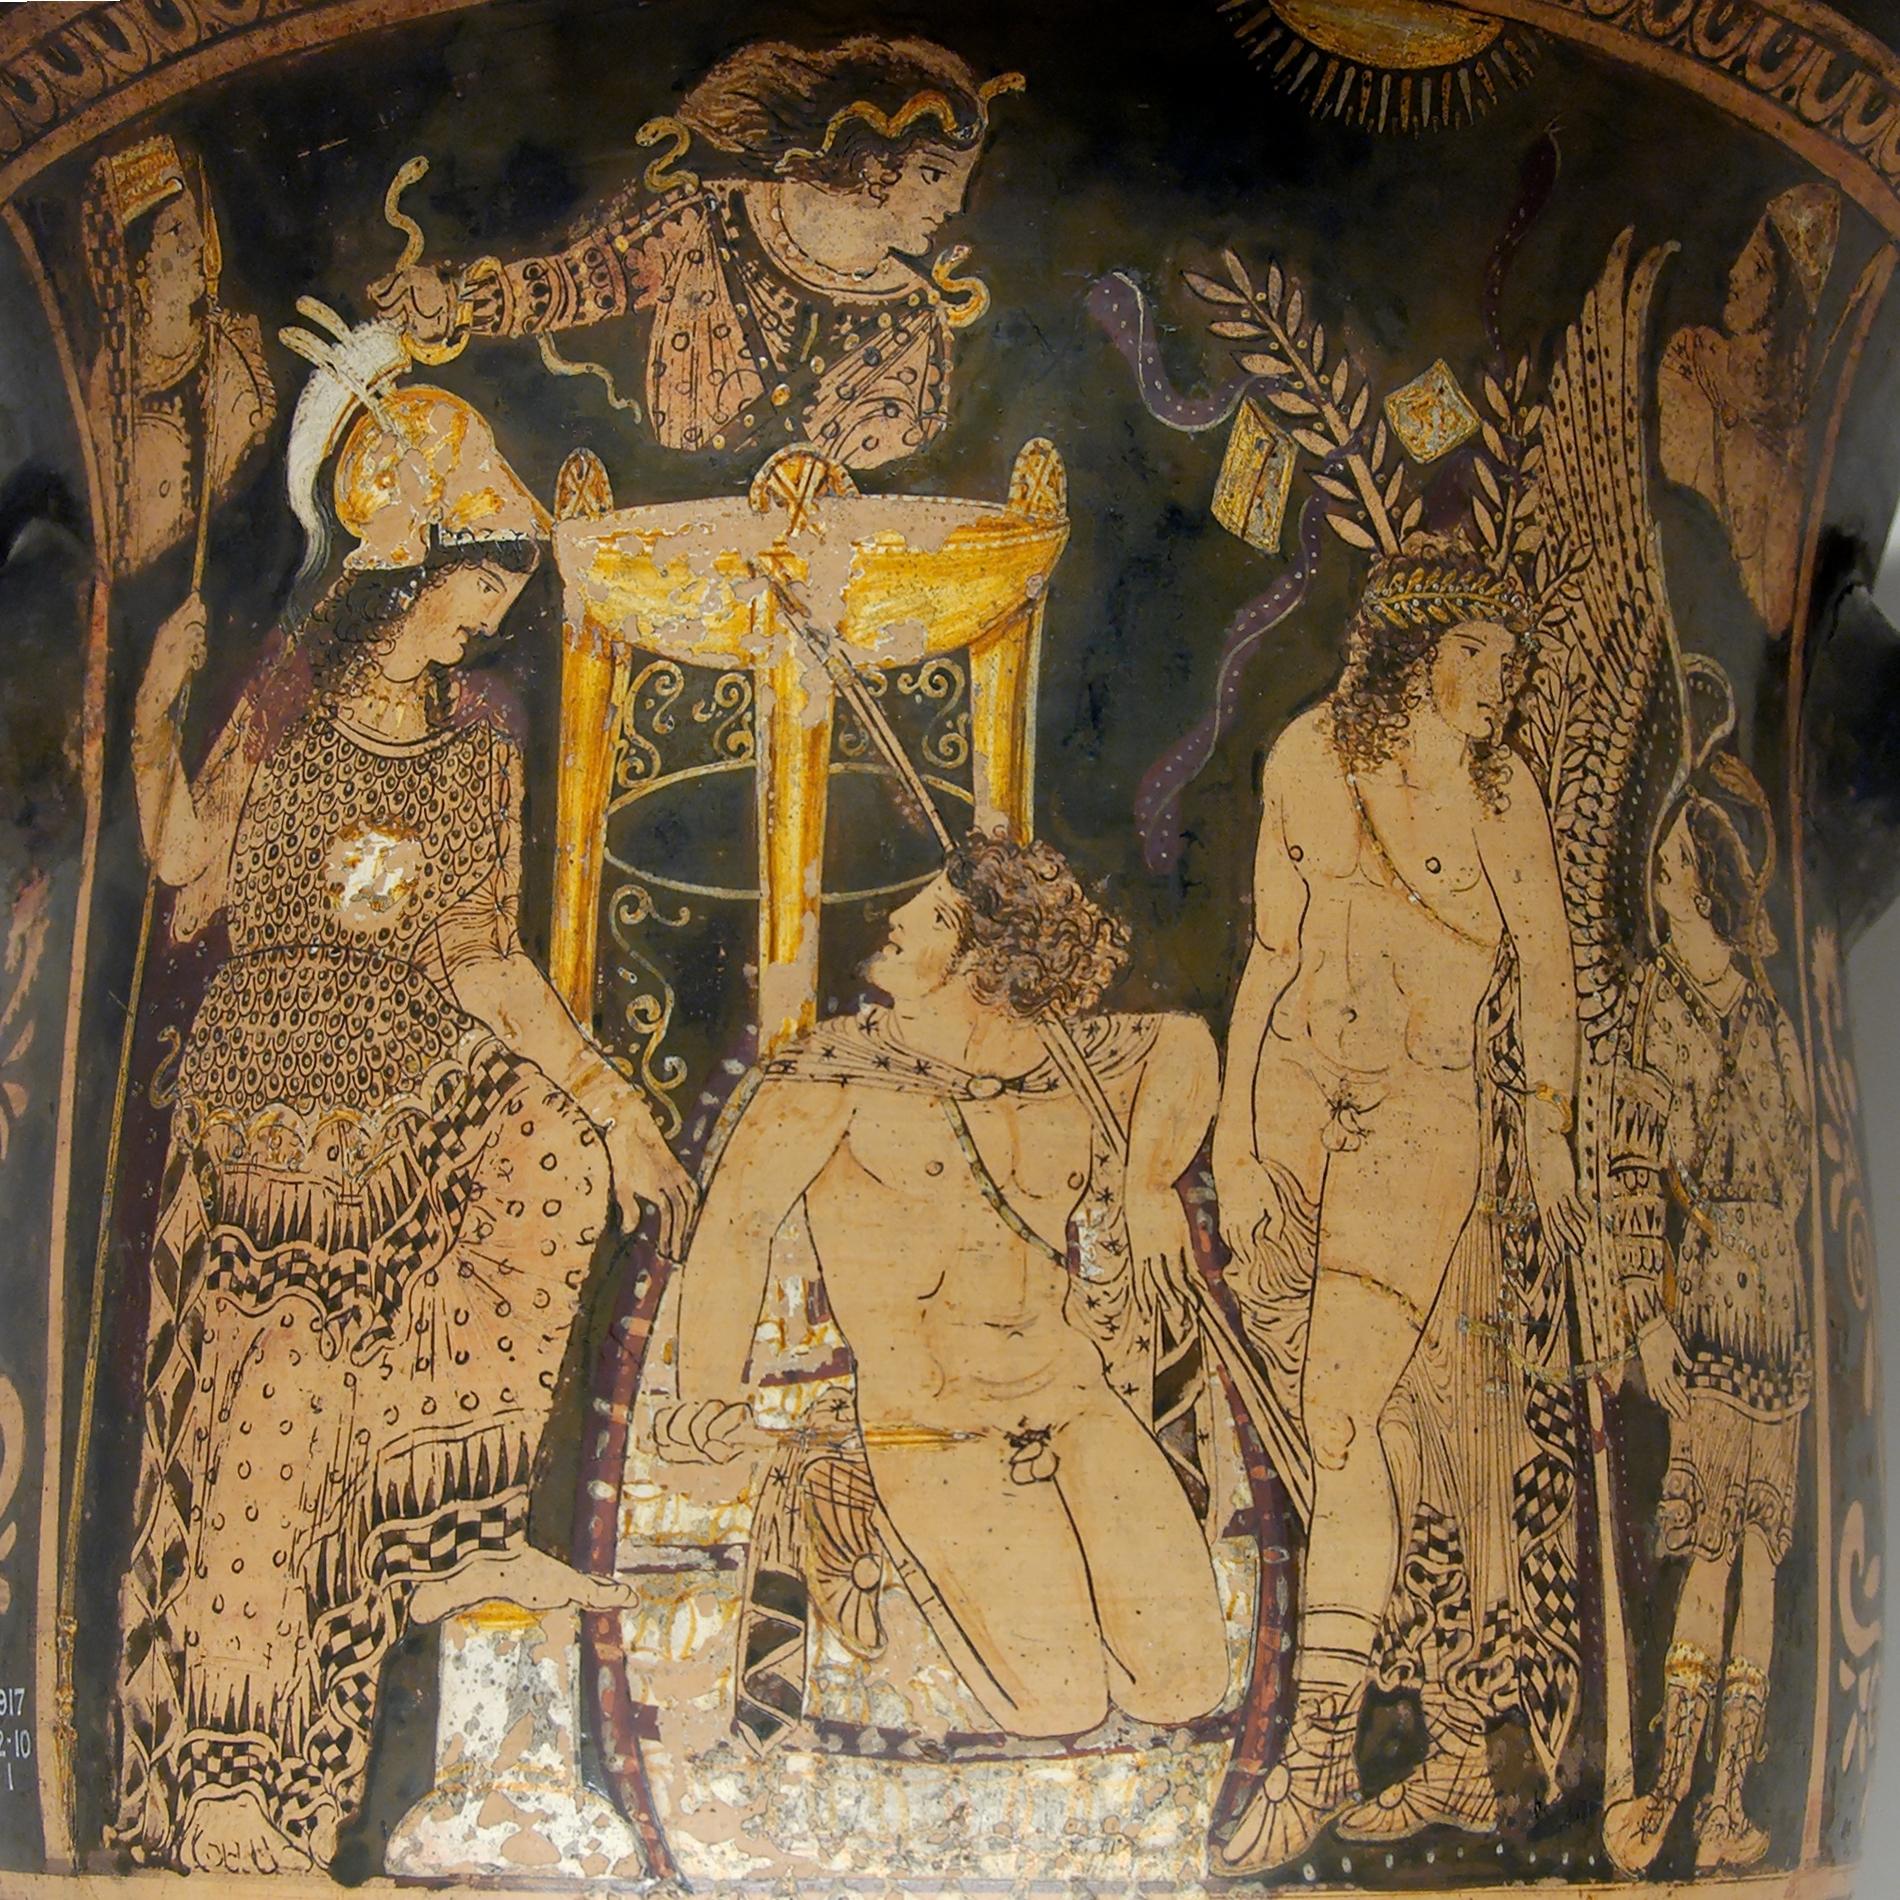 Caballero Sapuri, Juez del Infiero- Minos de Grifo (ss) Orestes_Delphi_BM_GR1917.12-10.1